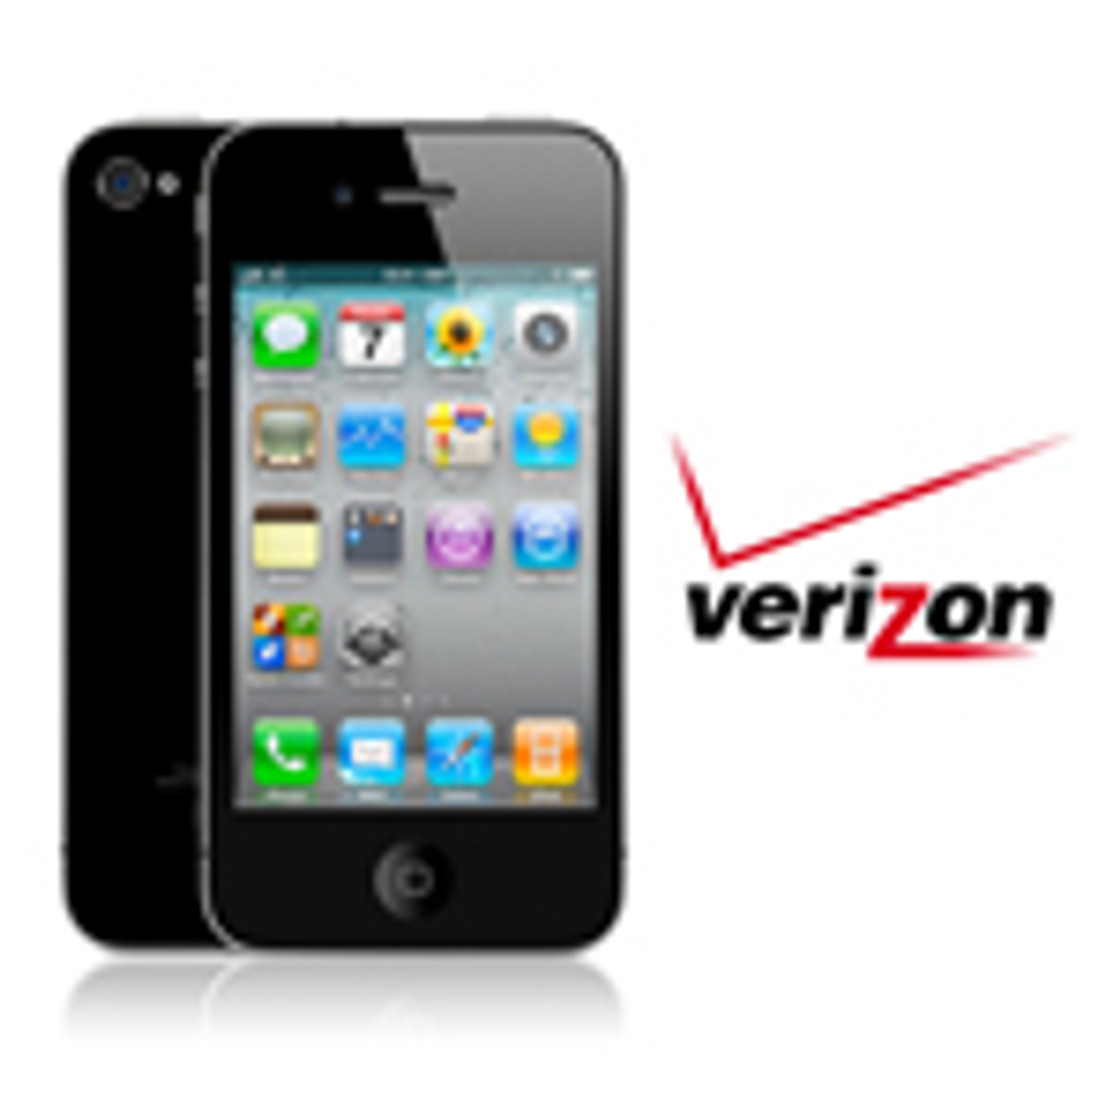 Verizon & Sprint iPhone 4